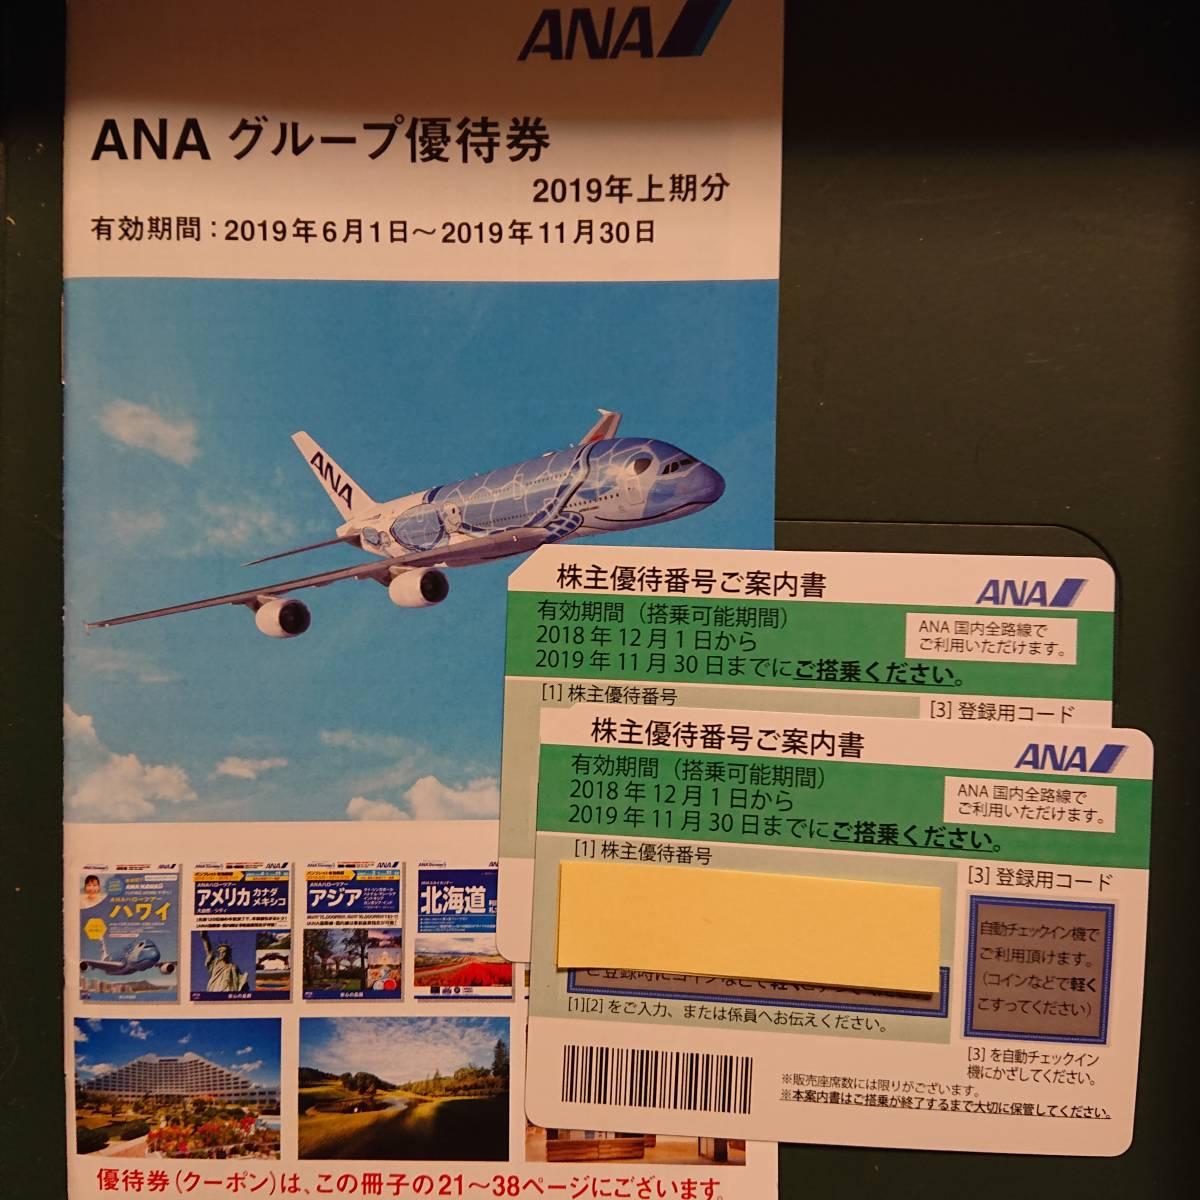 ANA株主優待券2枚セット(有効期限2019年11月30日まで)ANAグループ優待券つき、匿名配送